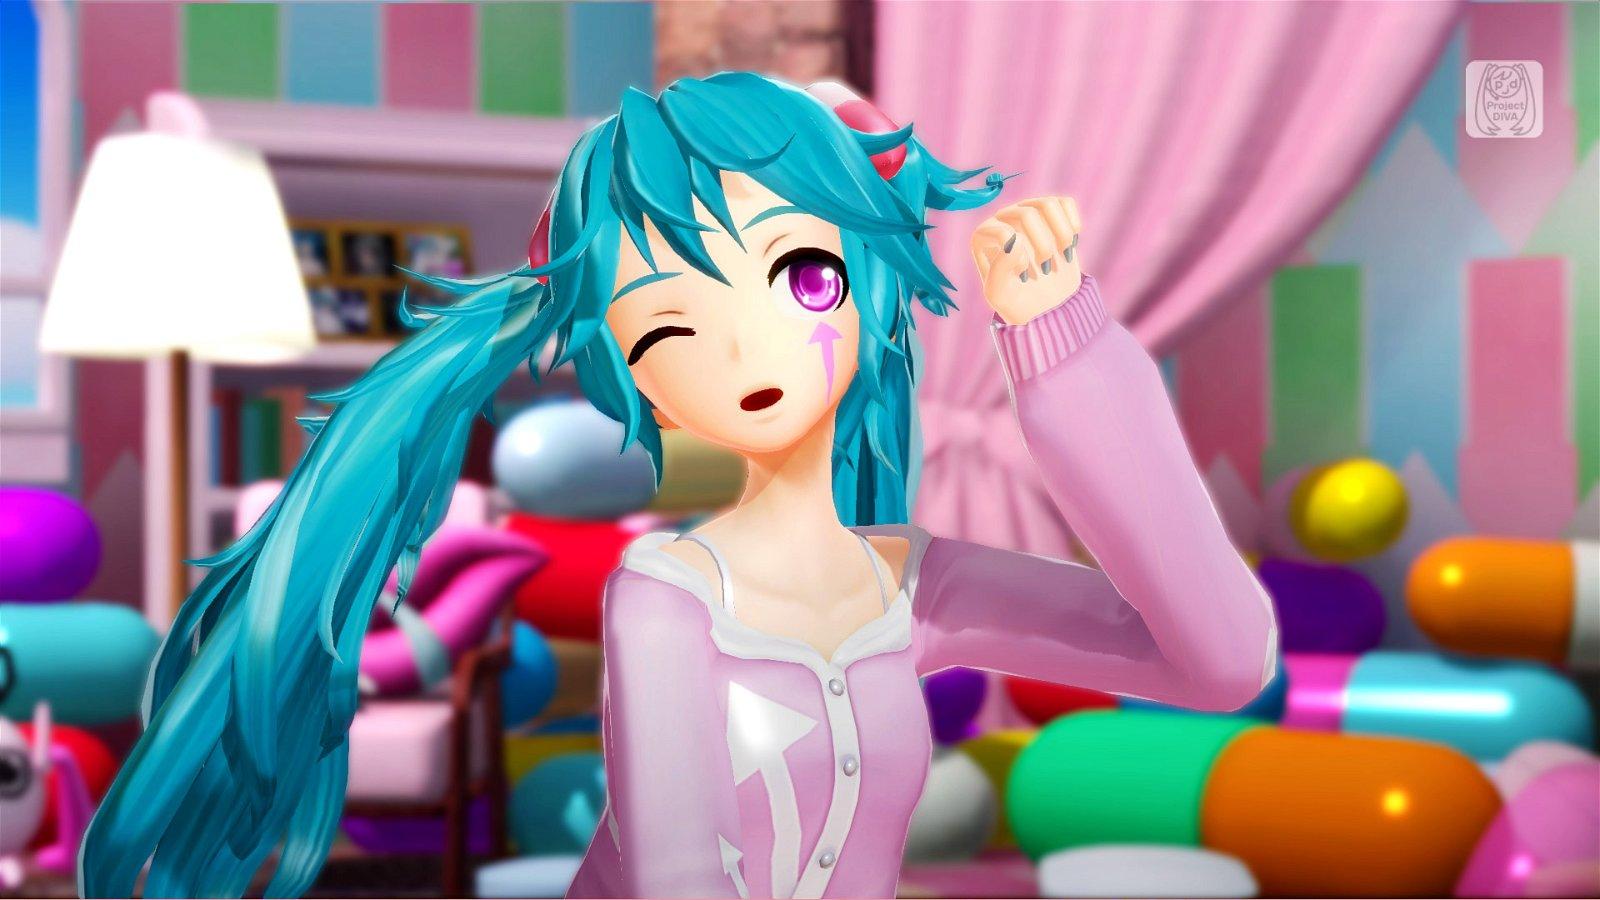 Hatsune Miku: The Rise Of Japan'S Premier Virtual Idol 3